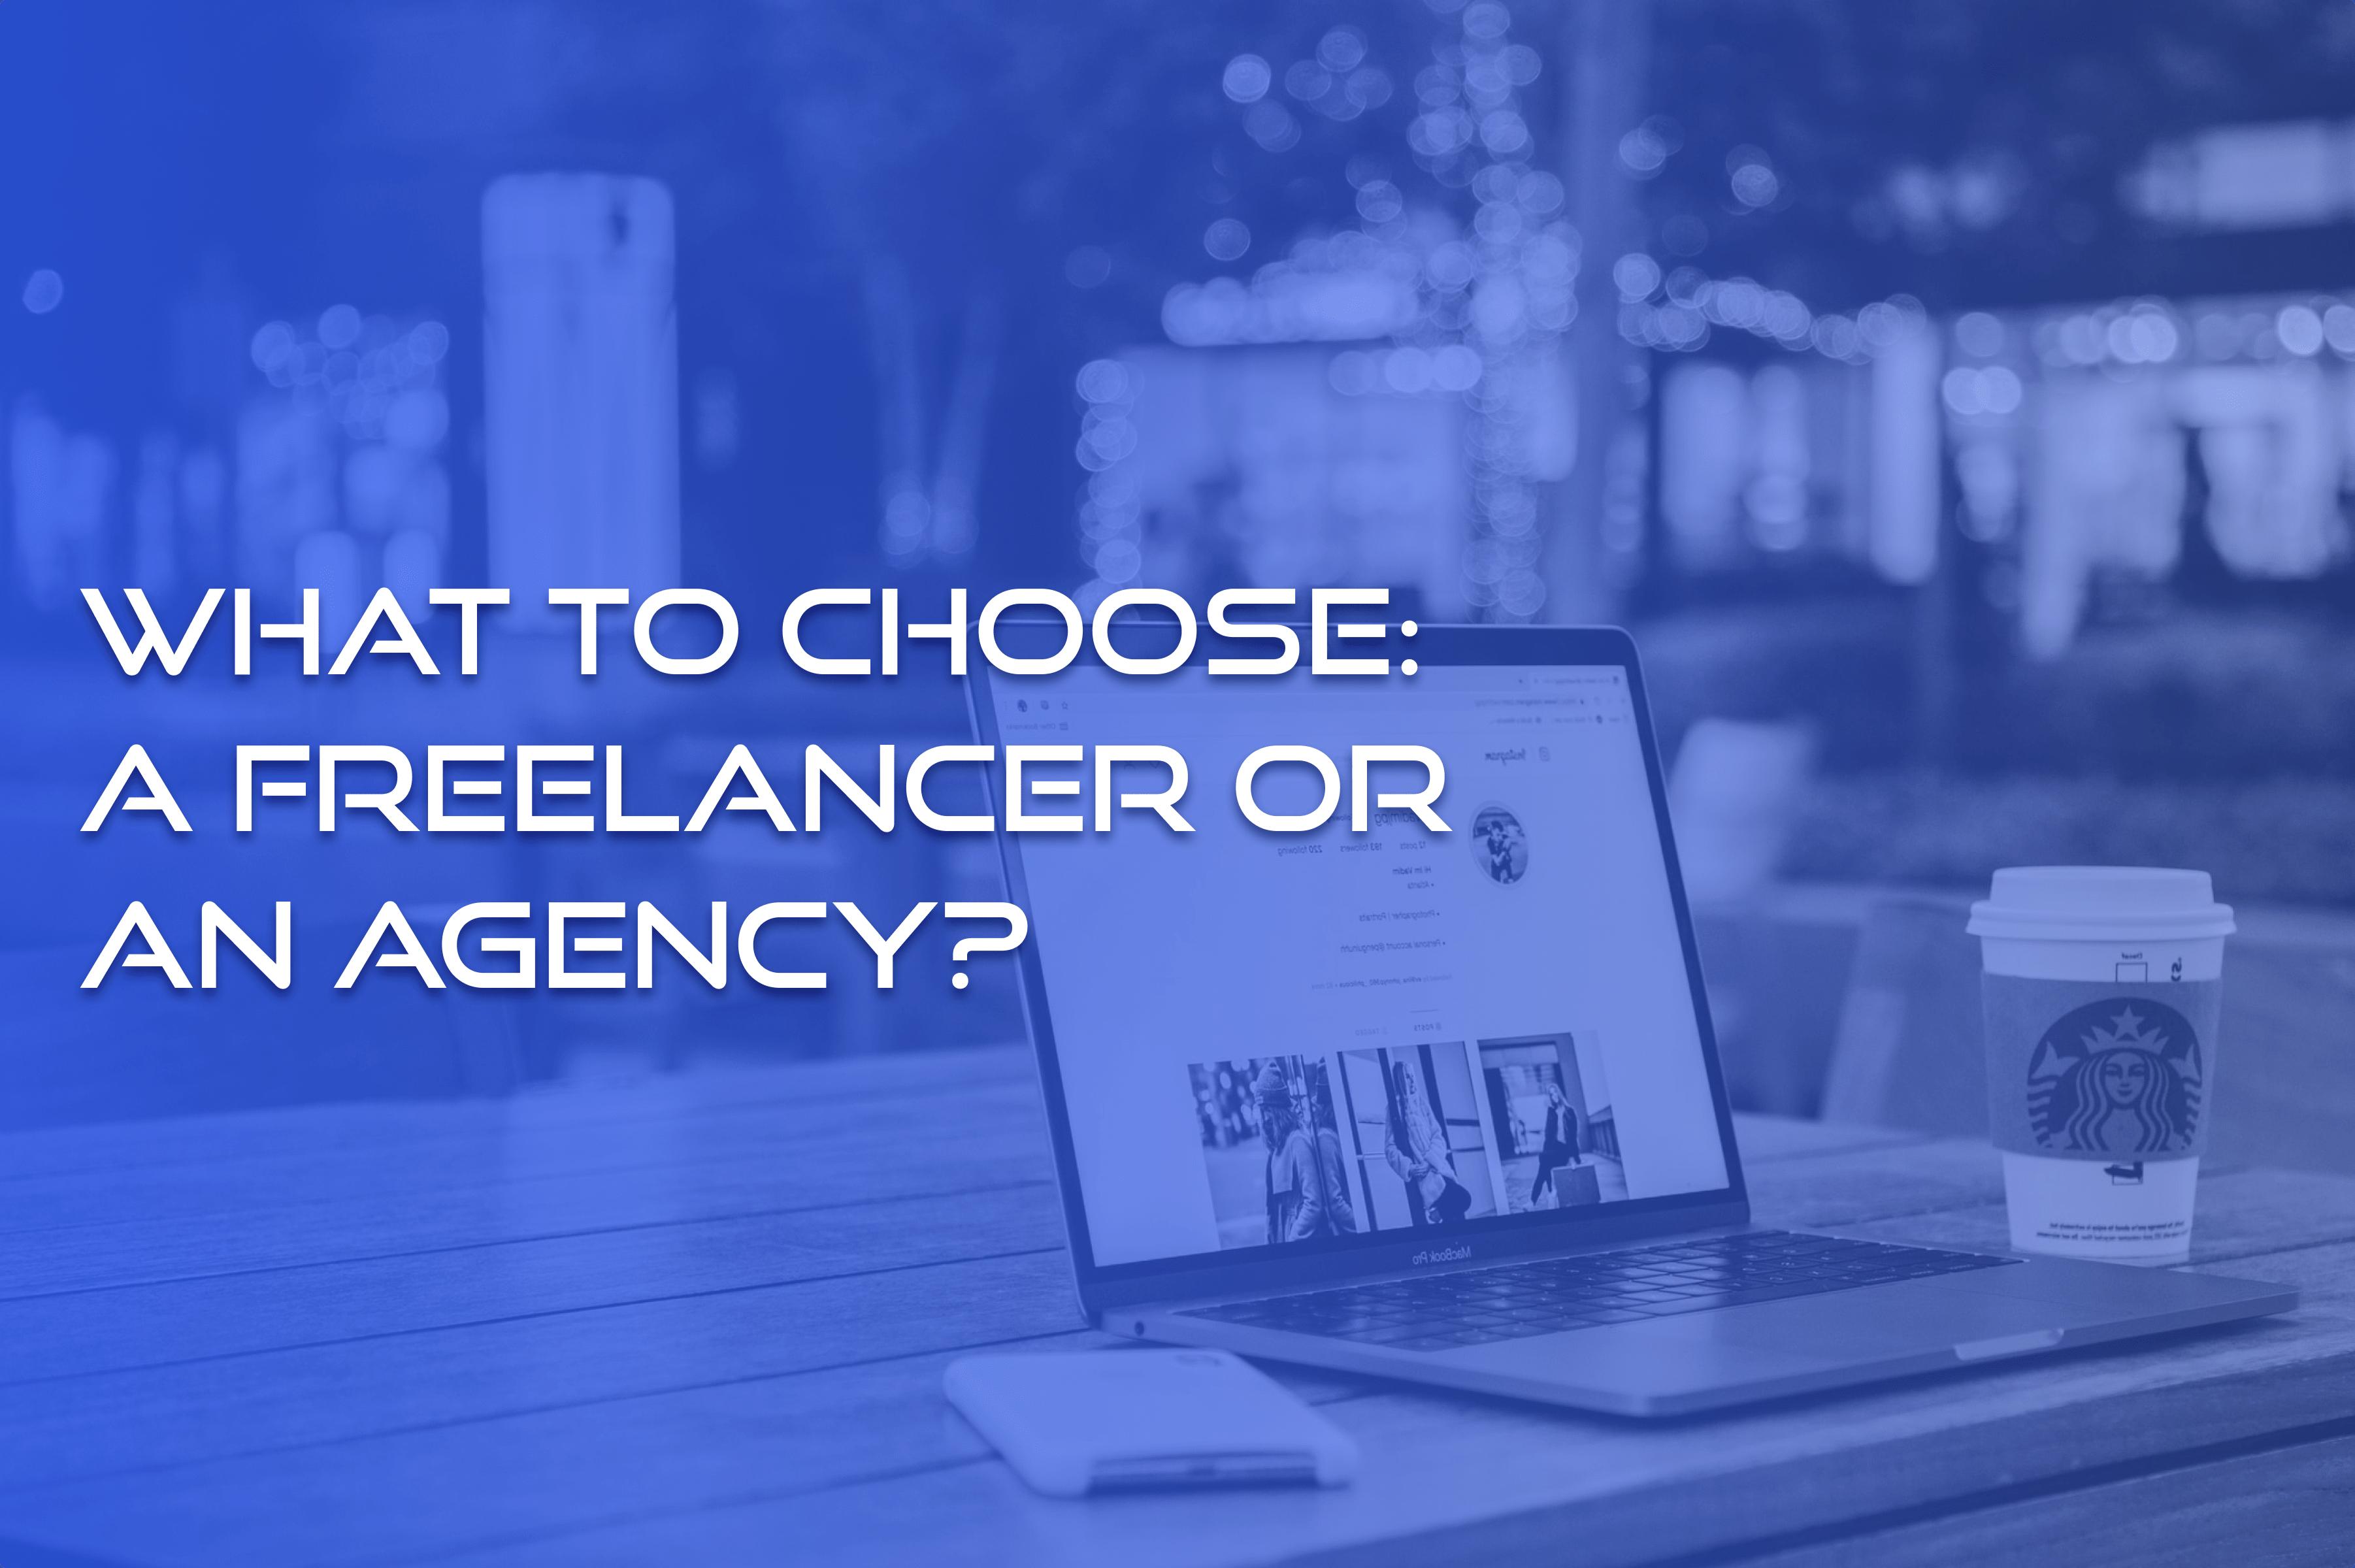 web development agency vs freelancer